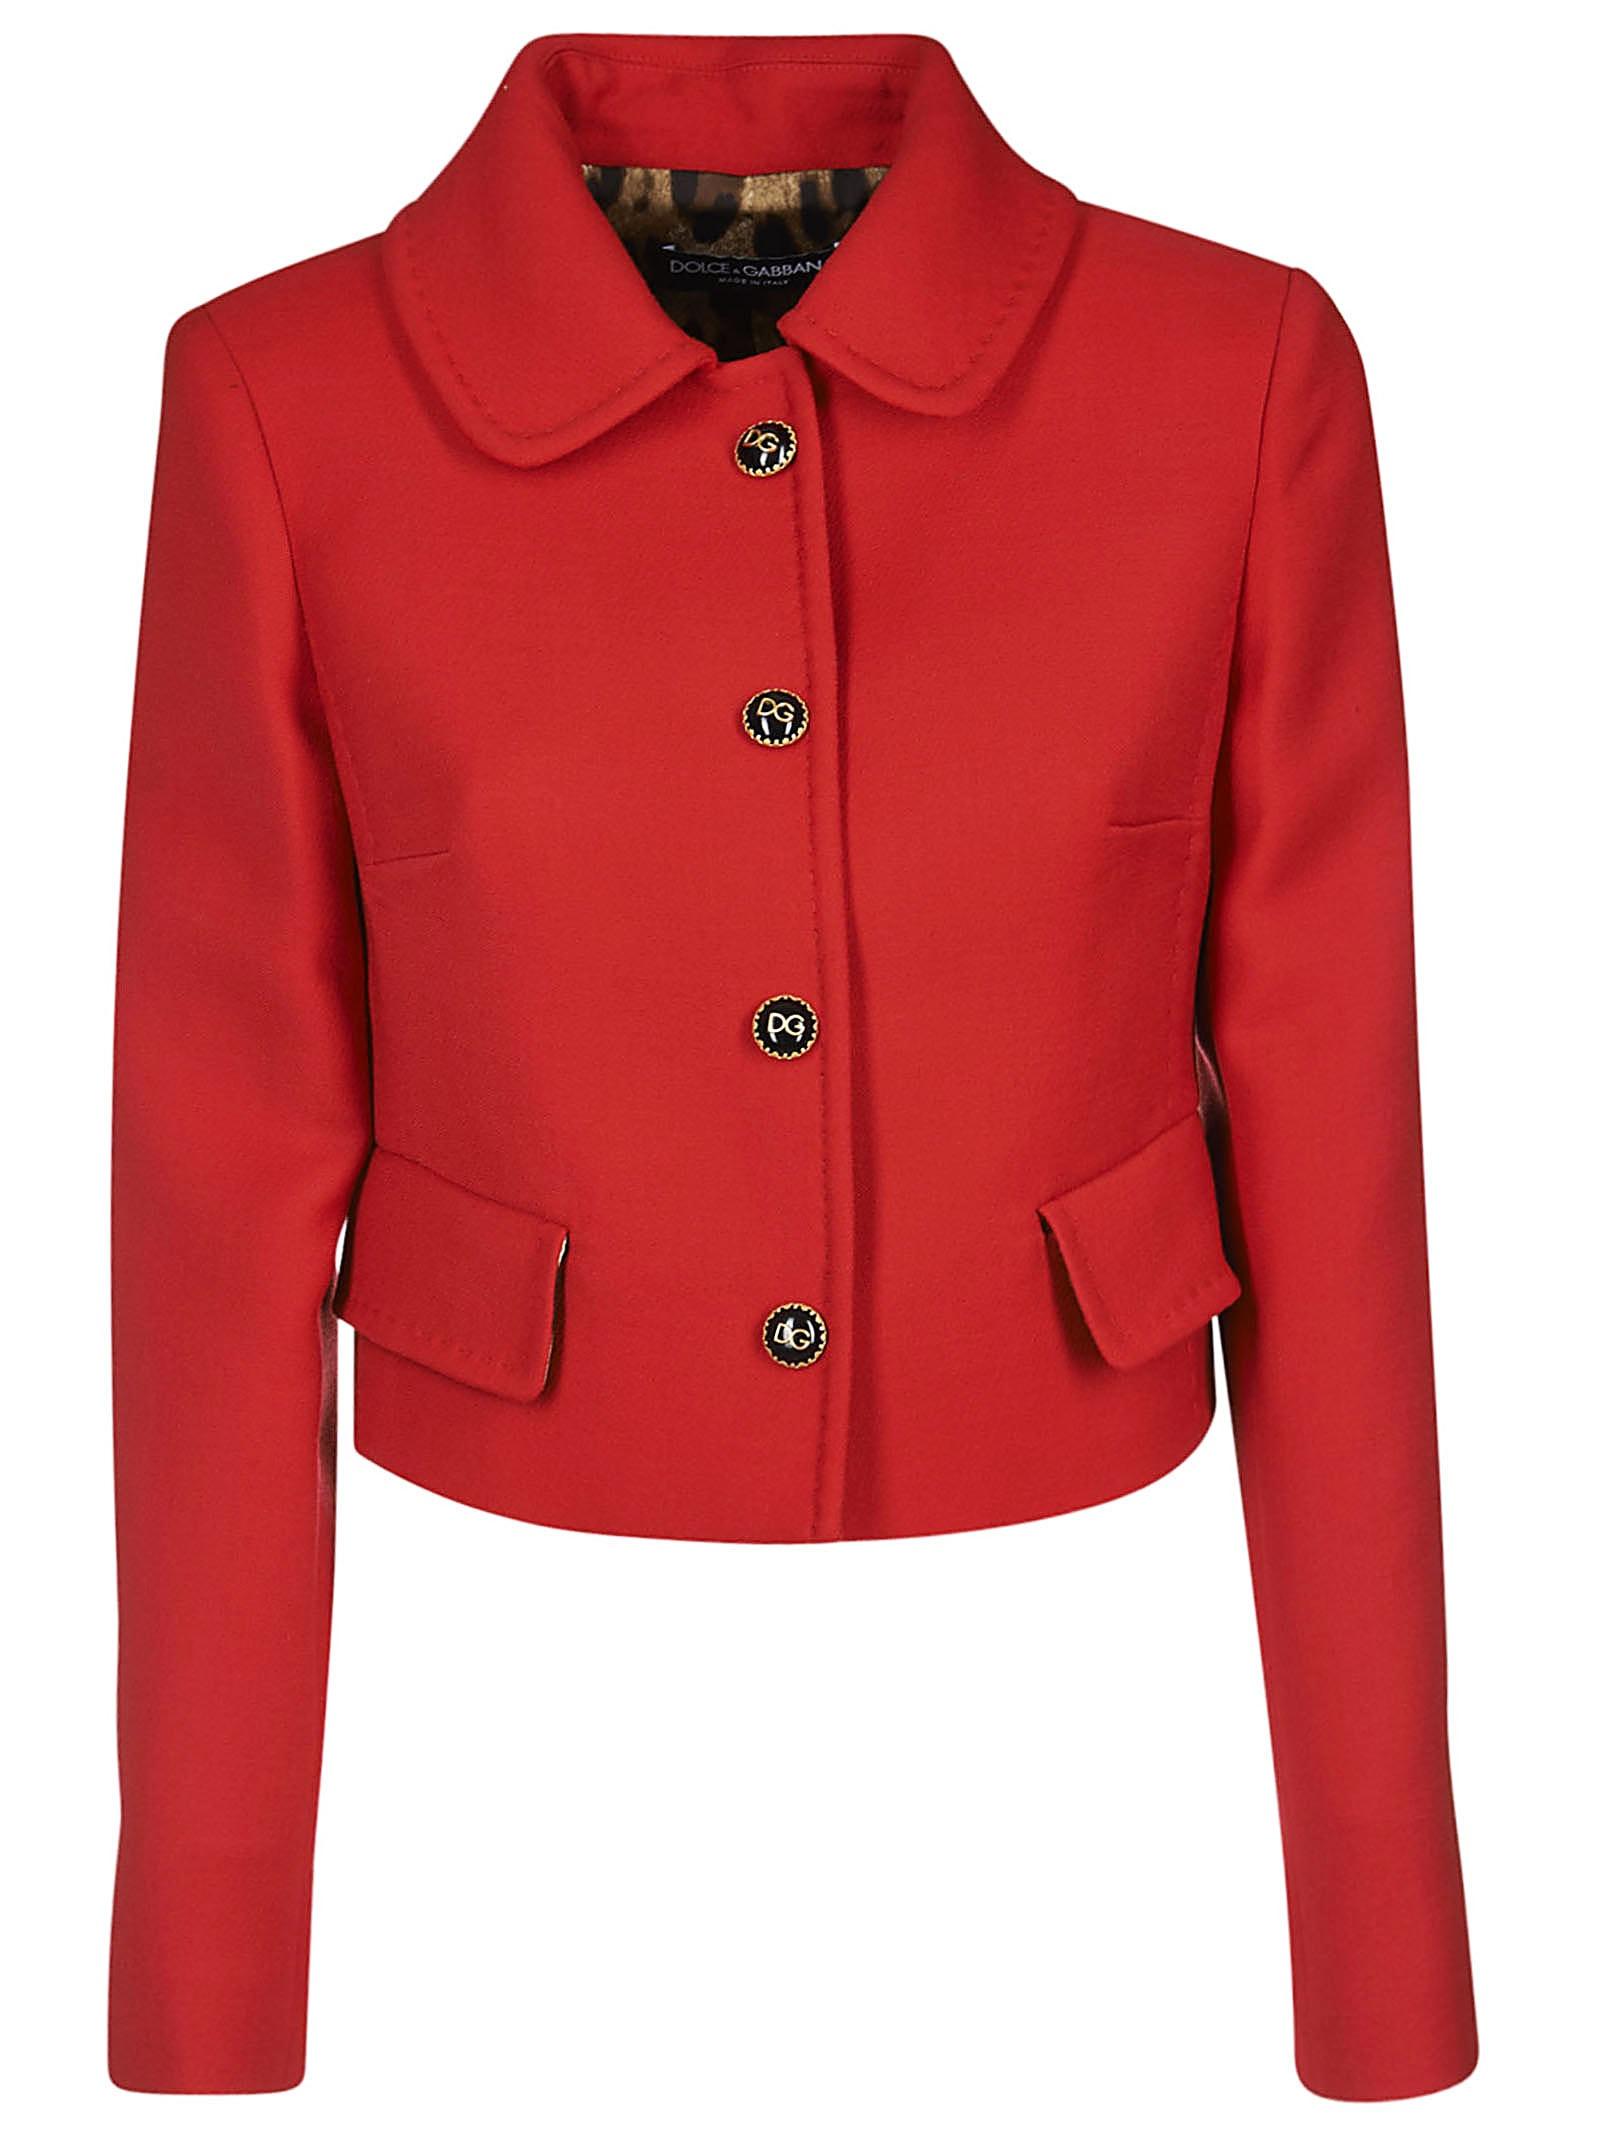 Dolce & Gabbana Single Breasted Jacket